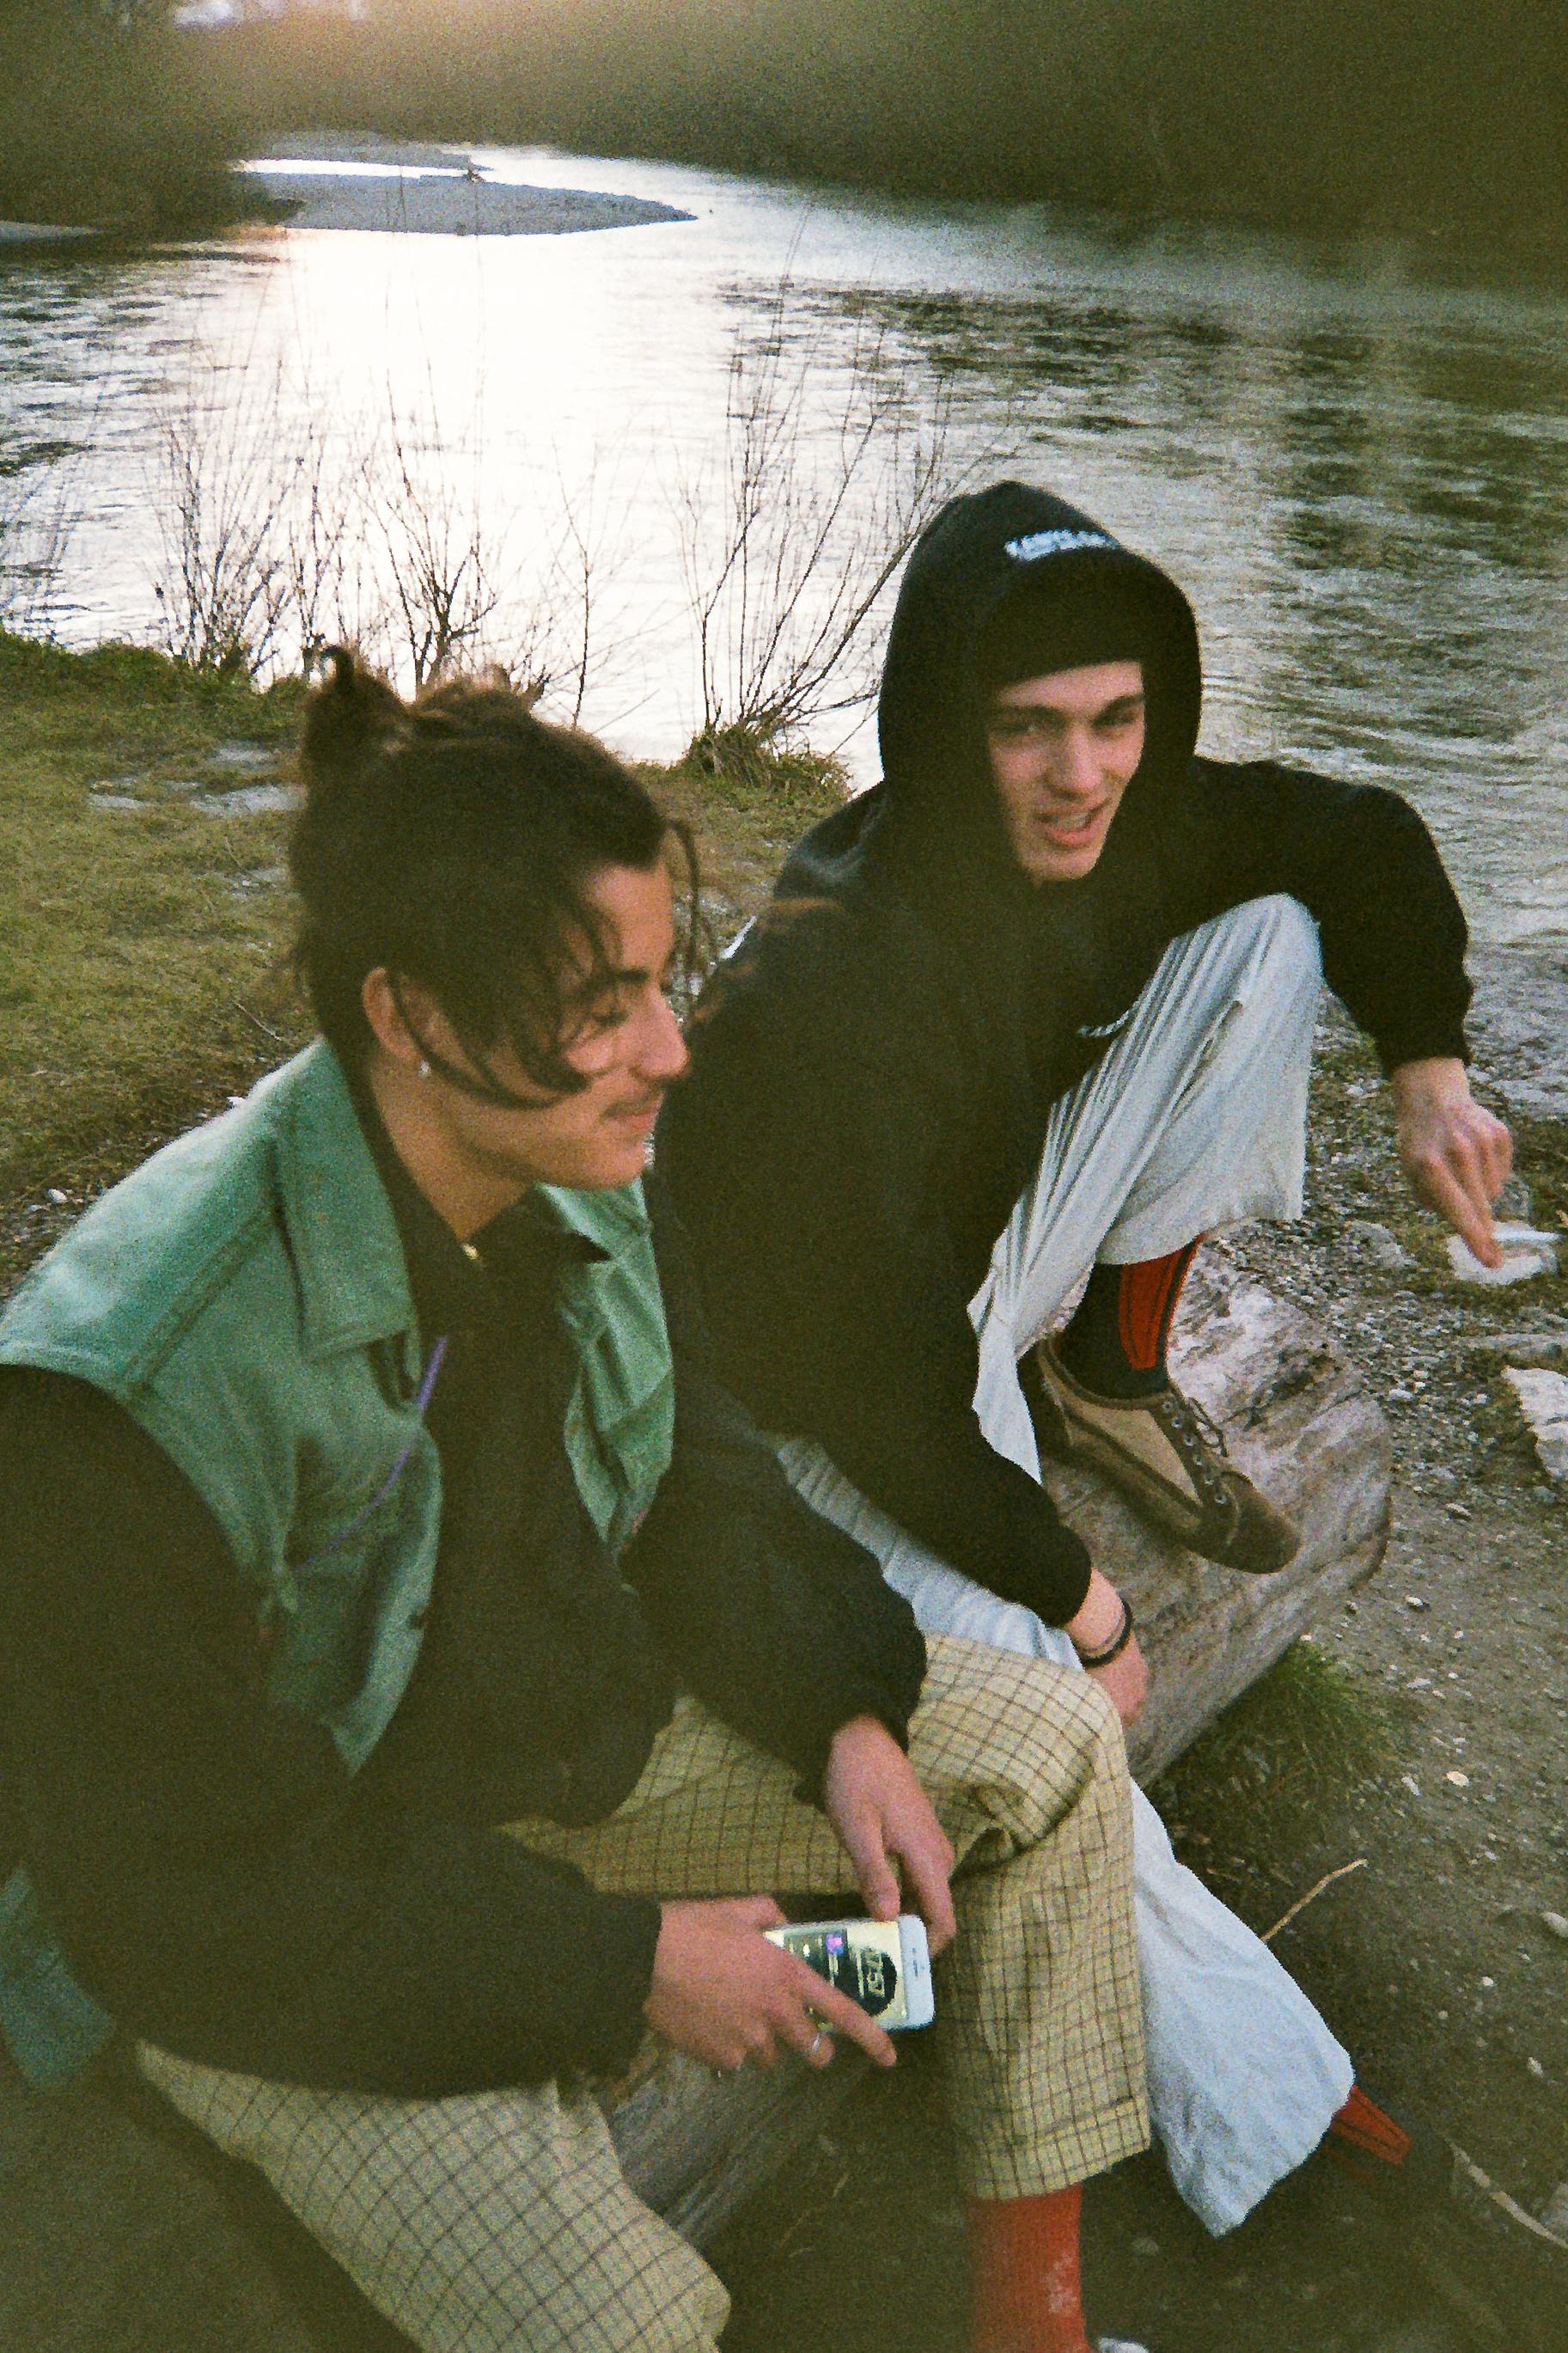 Bruno and Josi